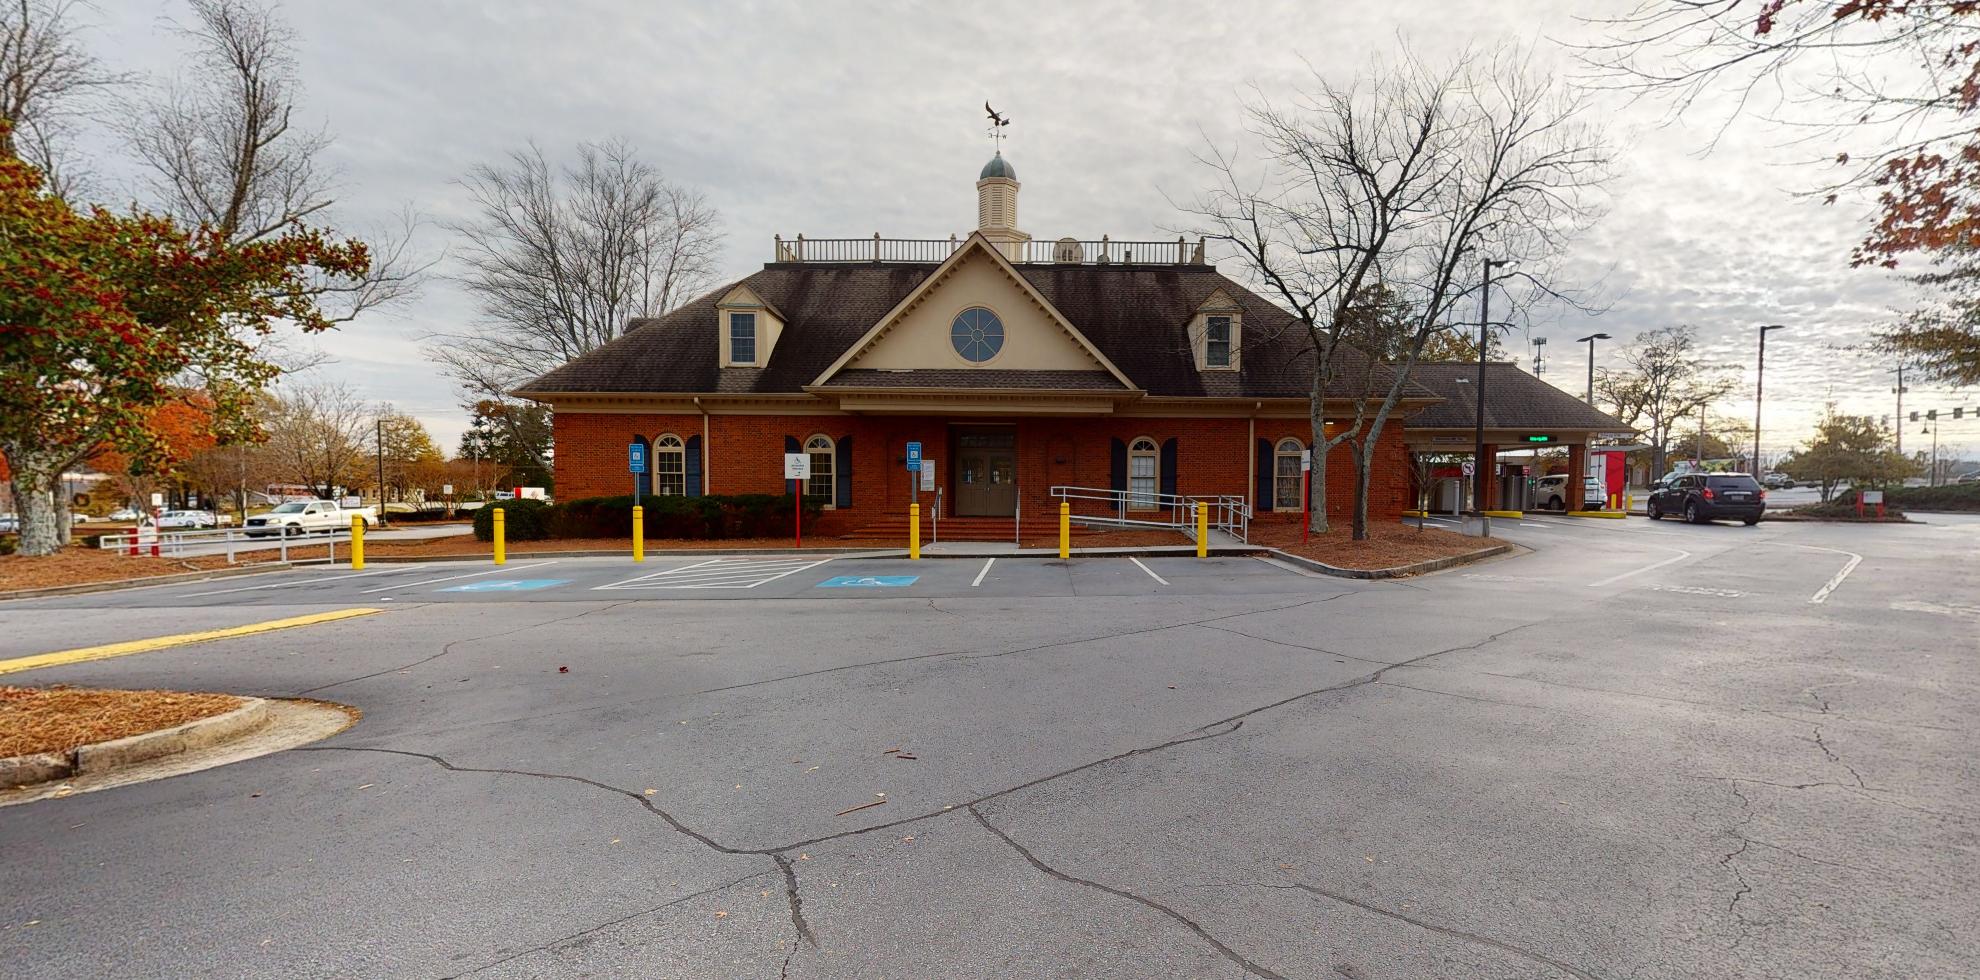 Bank of America financial center with drive-thru ATM | 2467 E Main St, Snellville, GA 30078